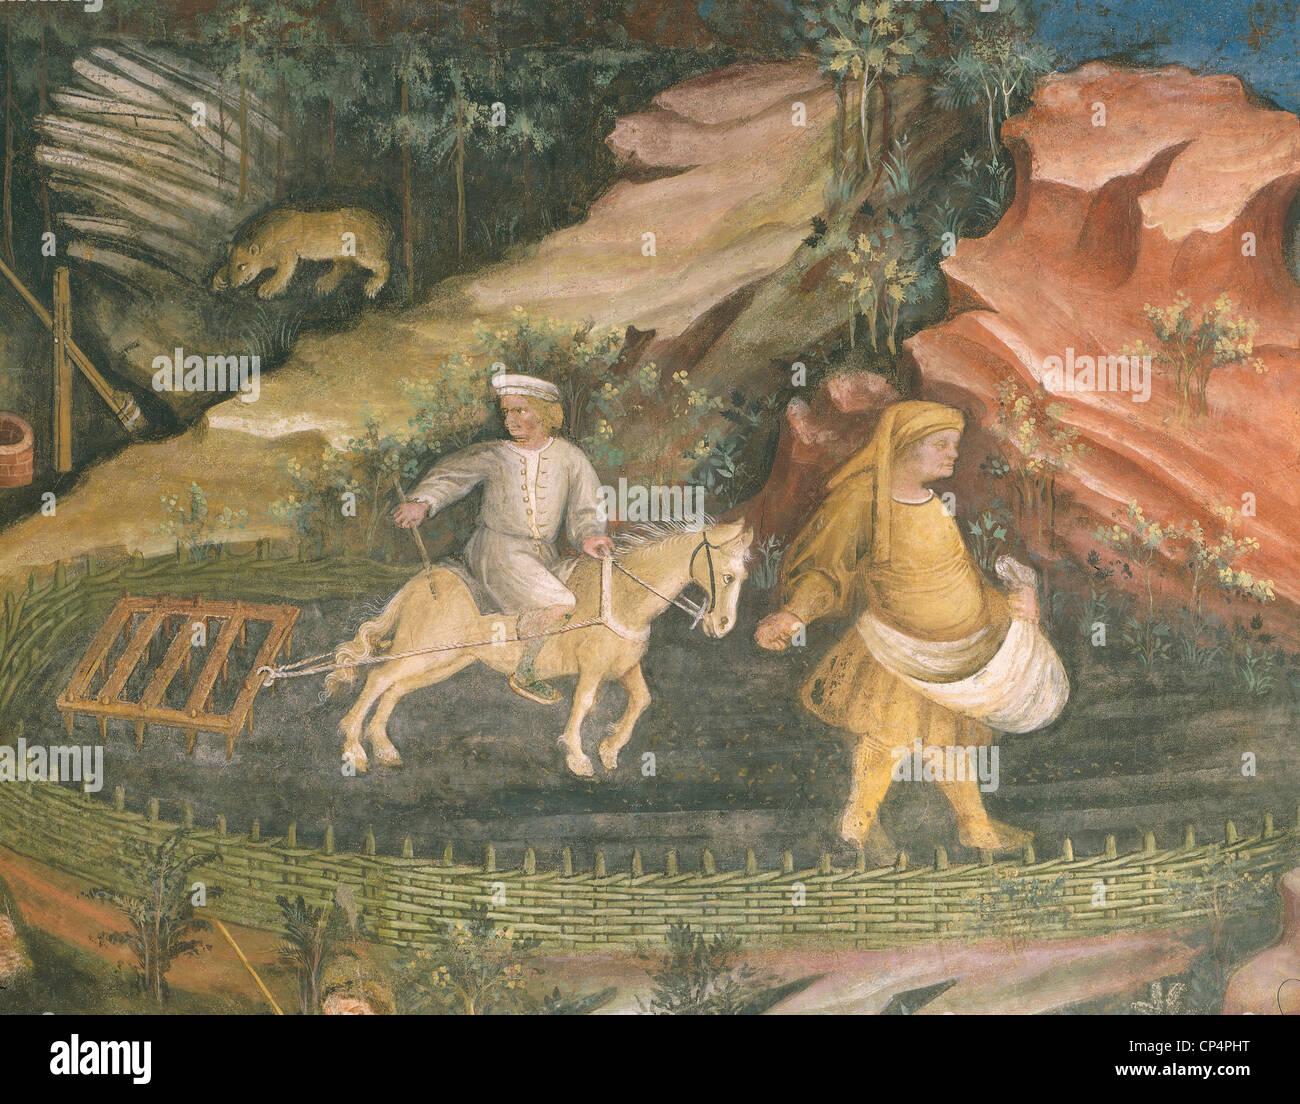 Fresco Buonconsiglio Trento Imagen De Stock